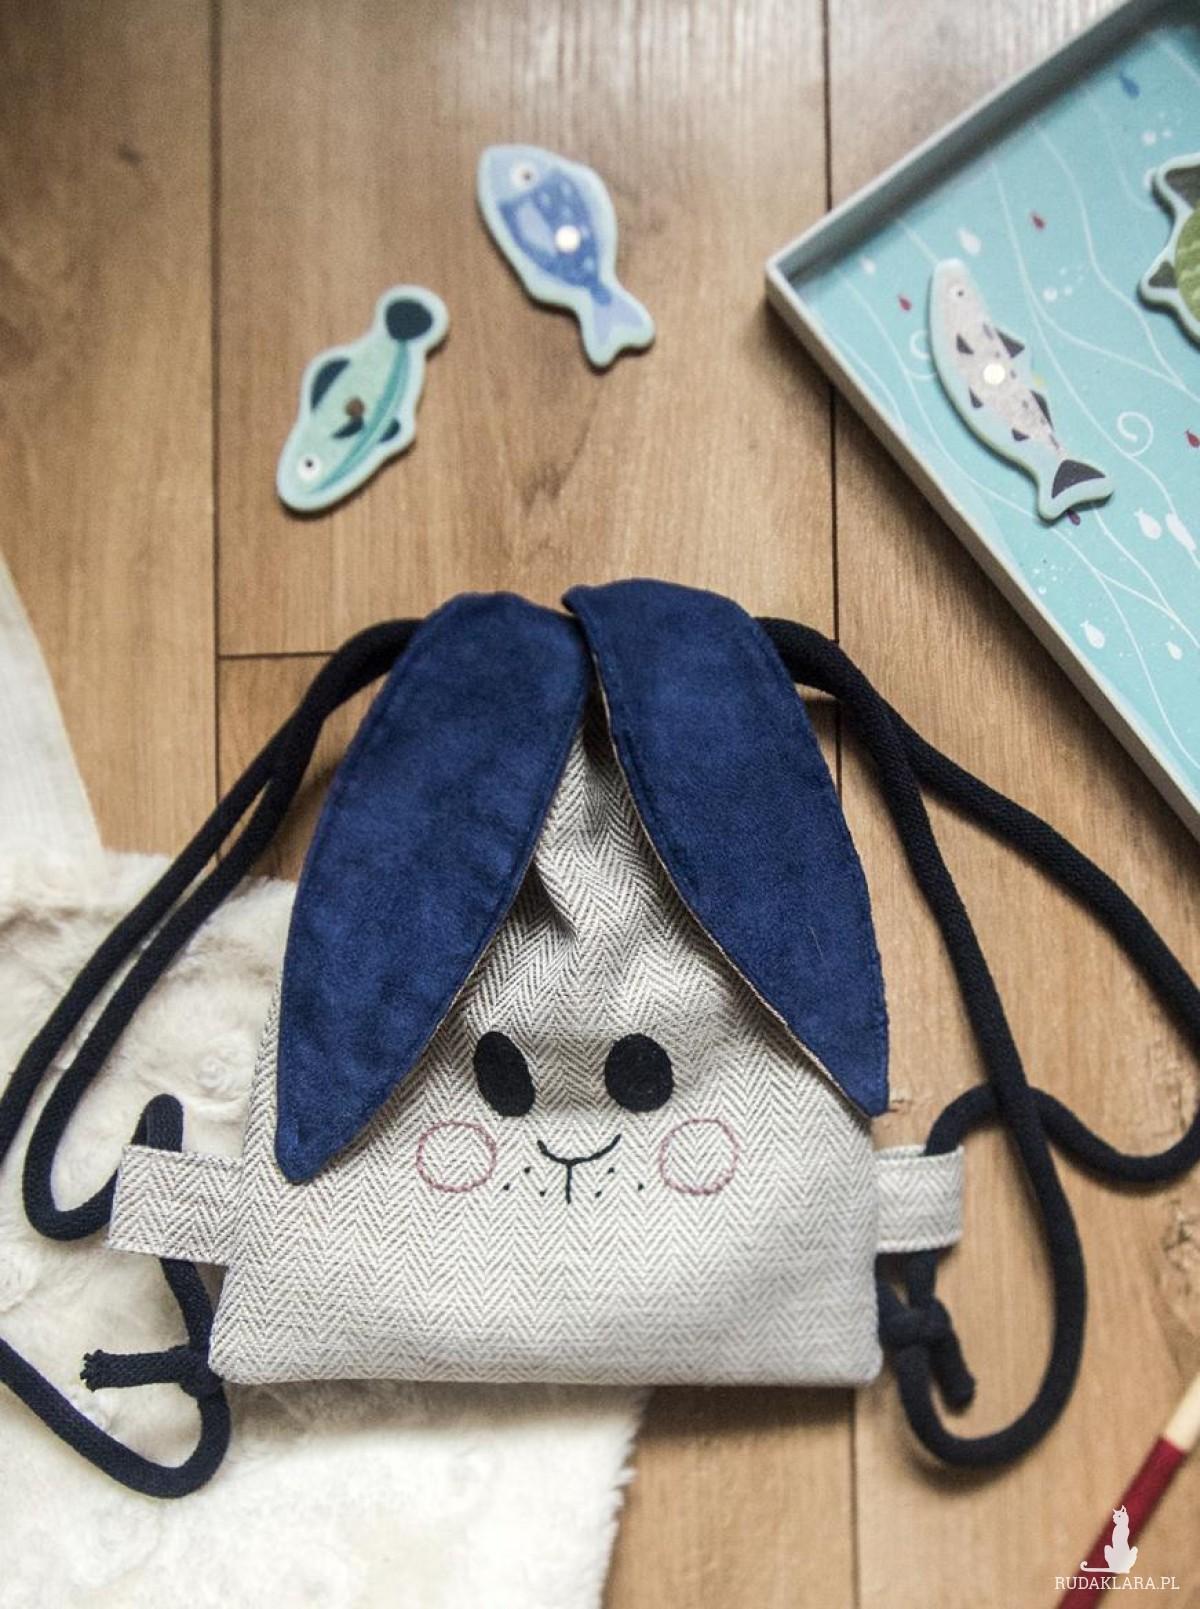 Mini plecak króliczek w jodełkę z granatem